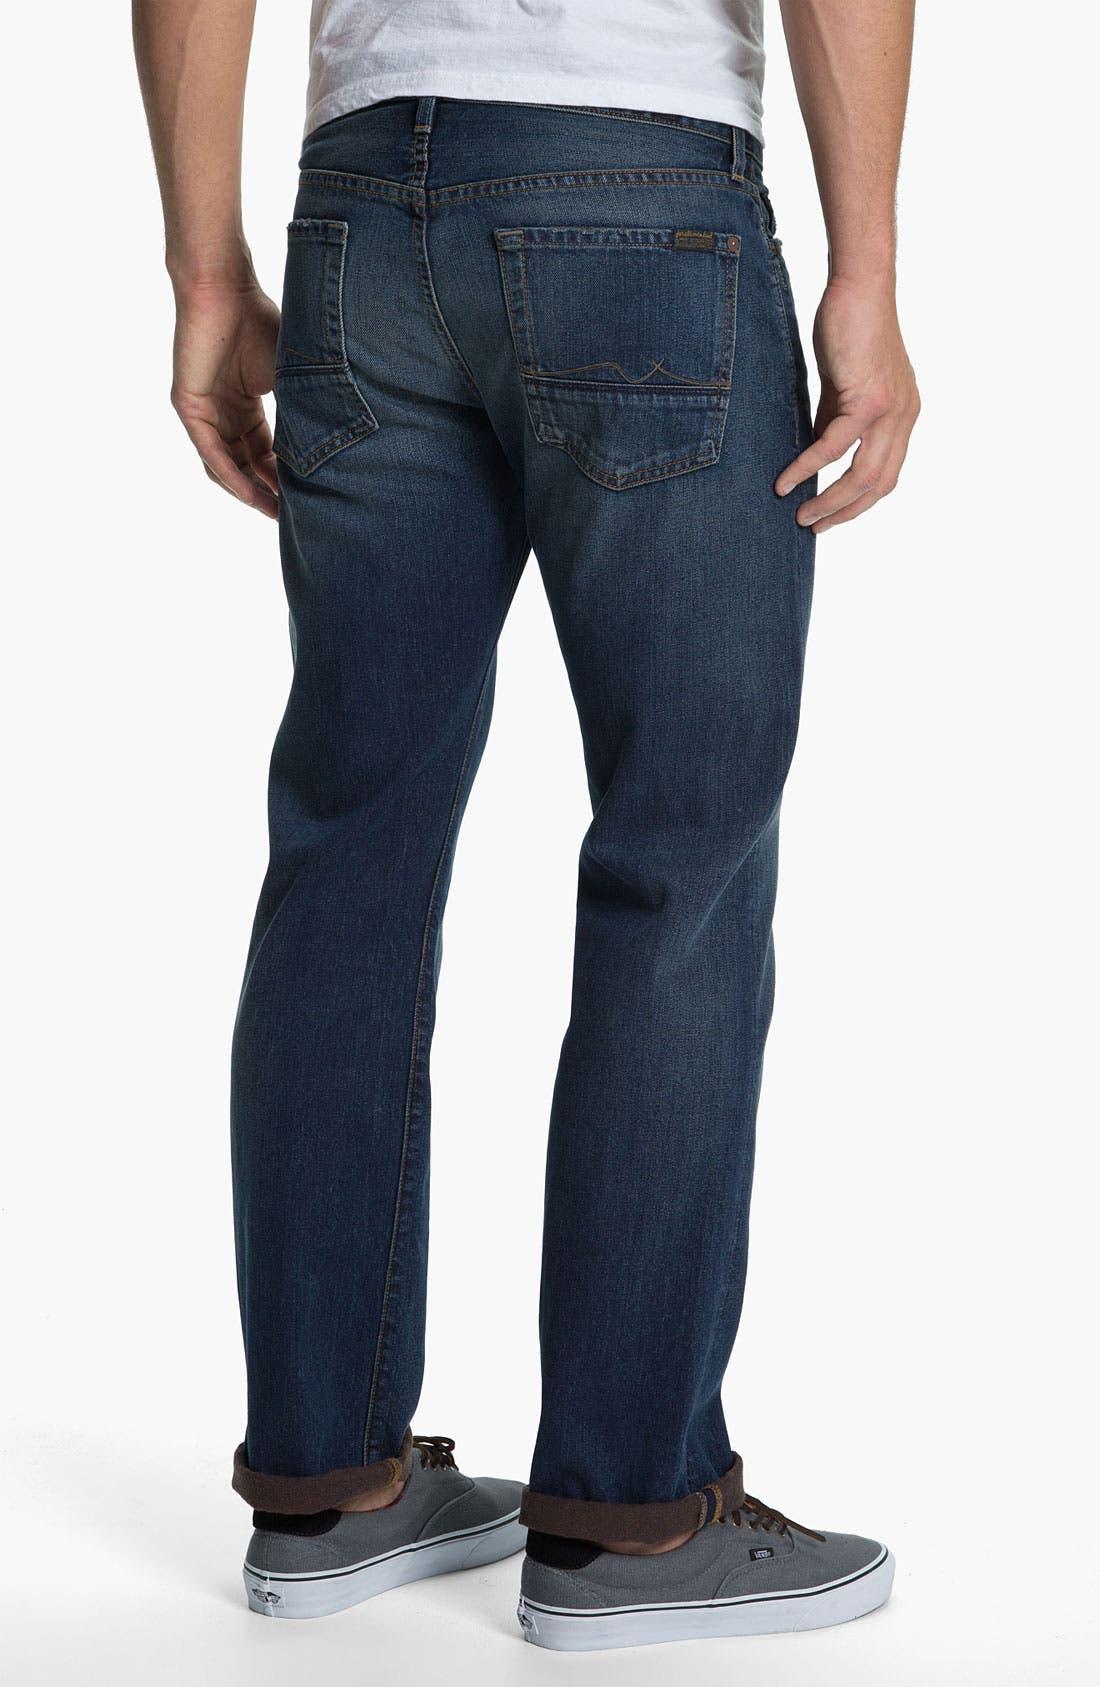 Alternate Image 1 Selected - 7 For All Mankind® Standard Straight Leg Jeans (Carmel Valley)